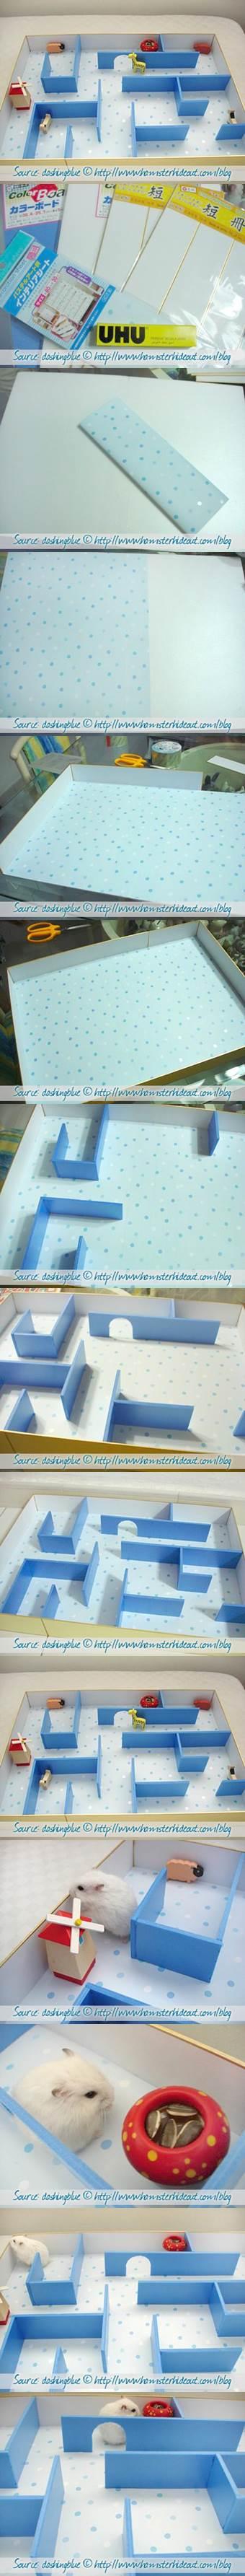 DIY Hamster Maze 2